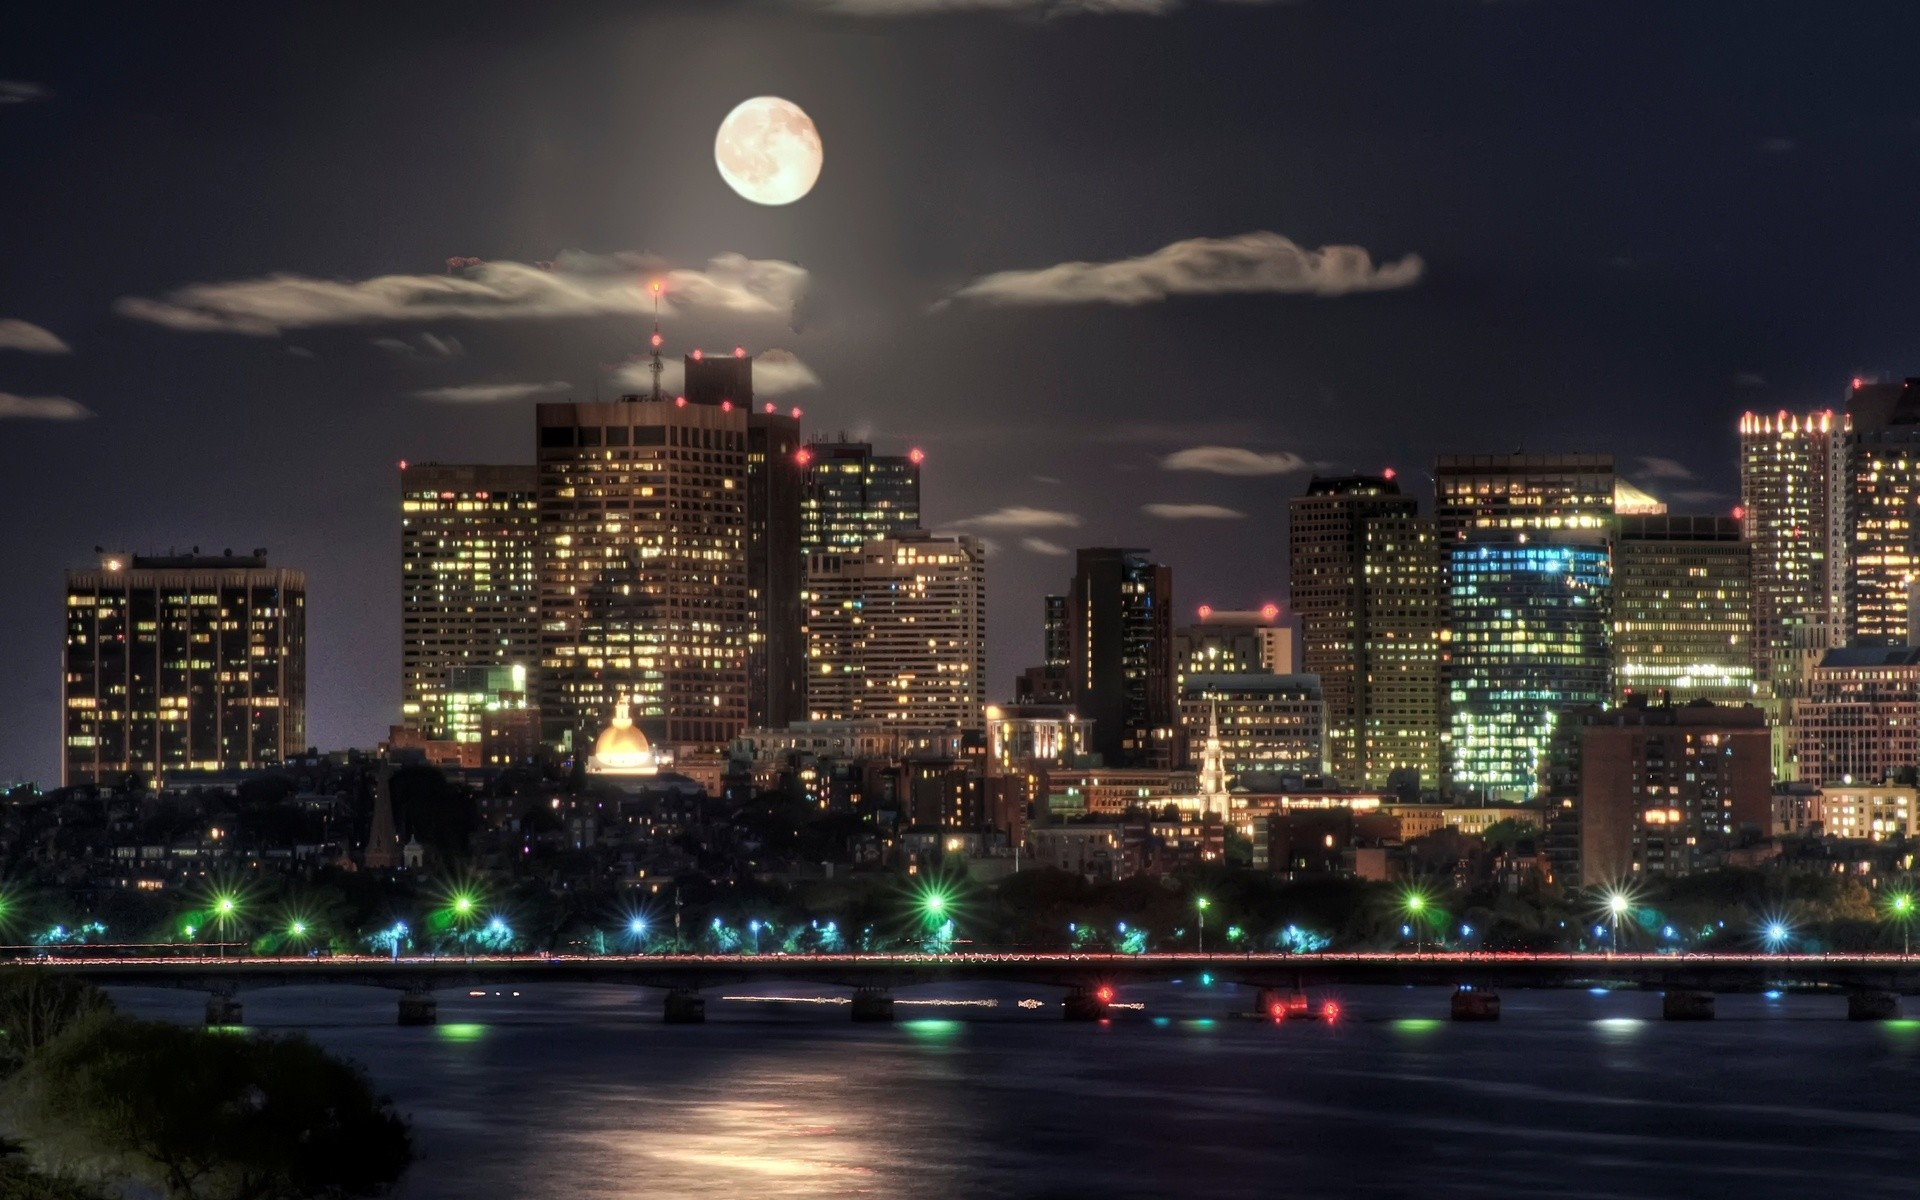 Image detail for -Wallpaper night, city, lights, moon   HD Desktop  Wallpapers